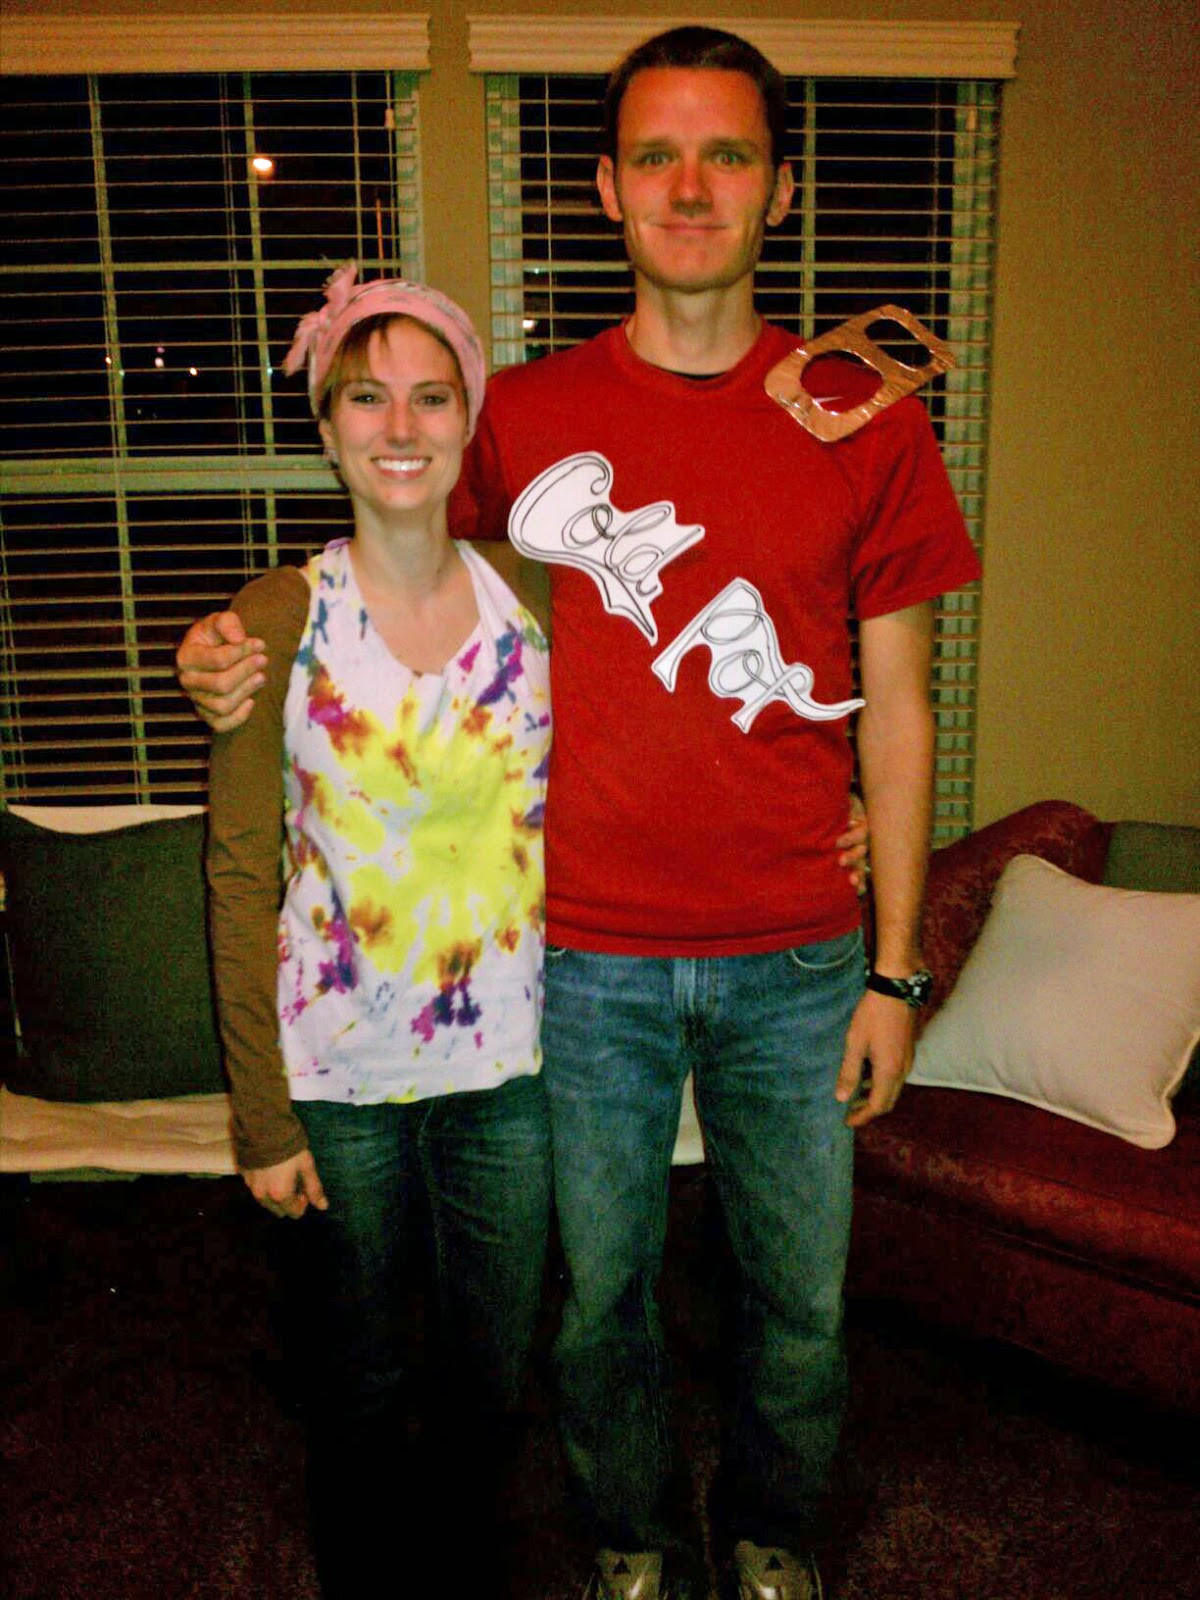 Couples Costumes DIY  Katie in Kansas DIY to DIY Halloween Costumes